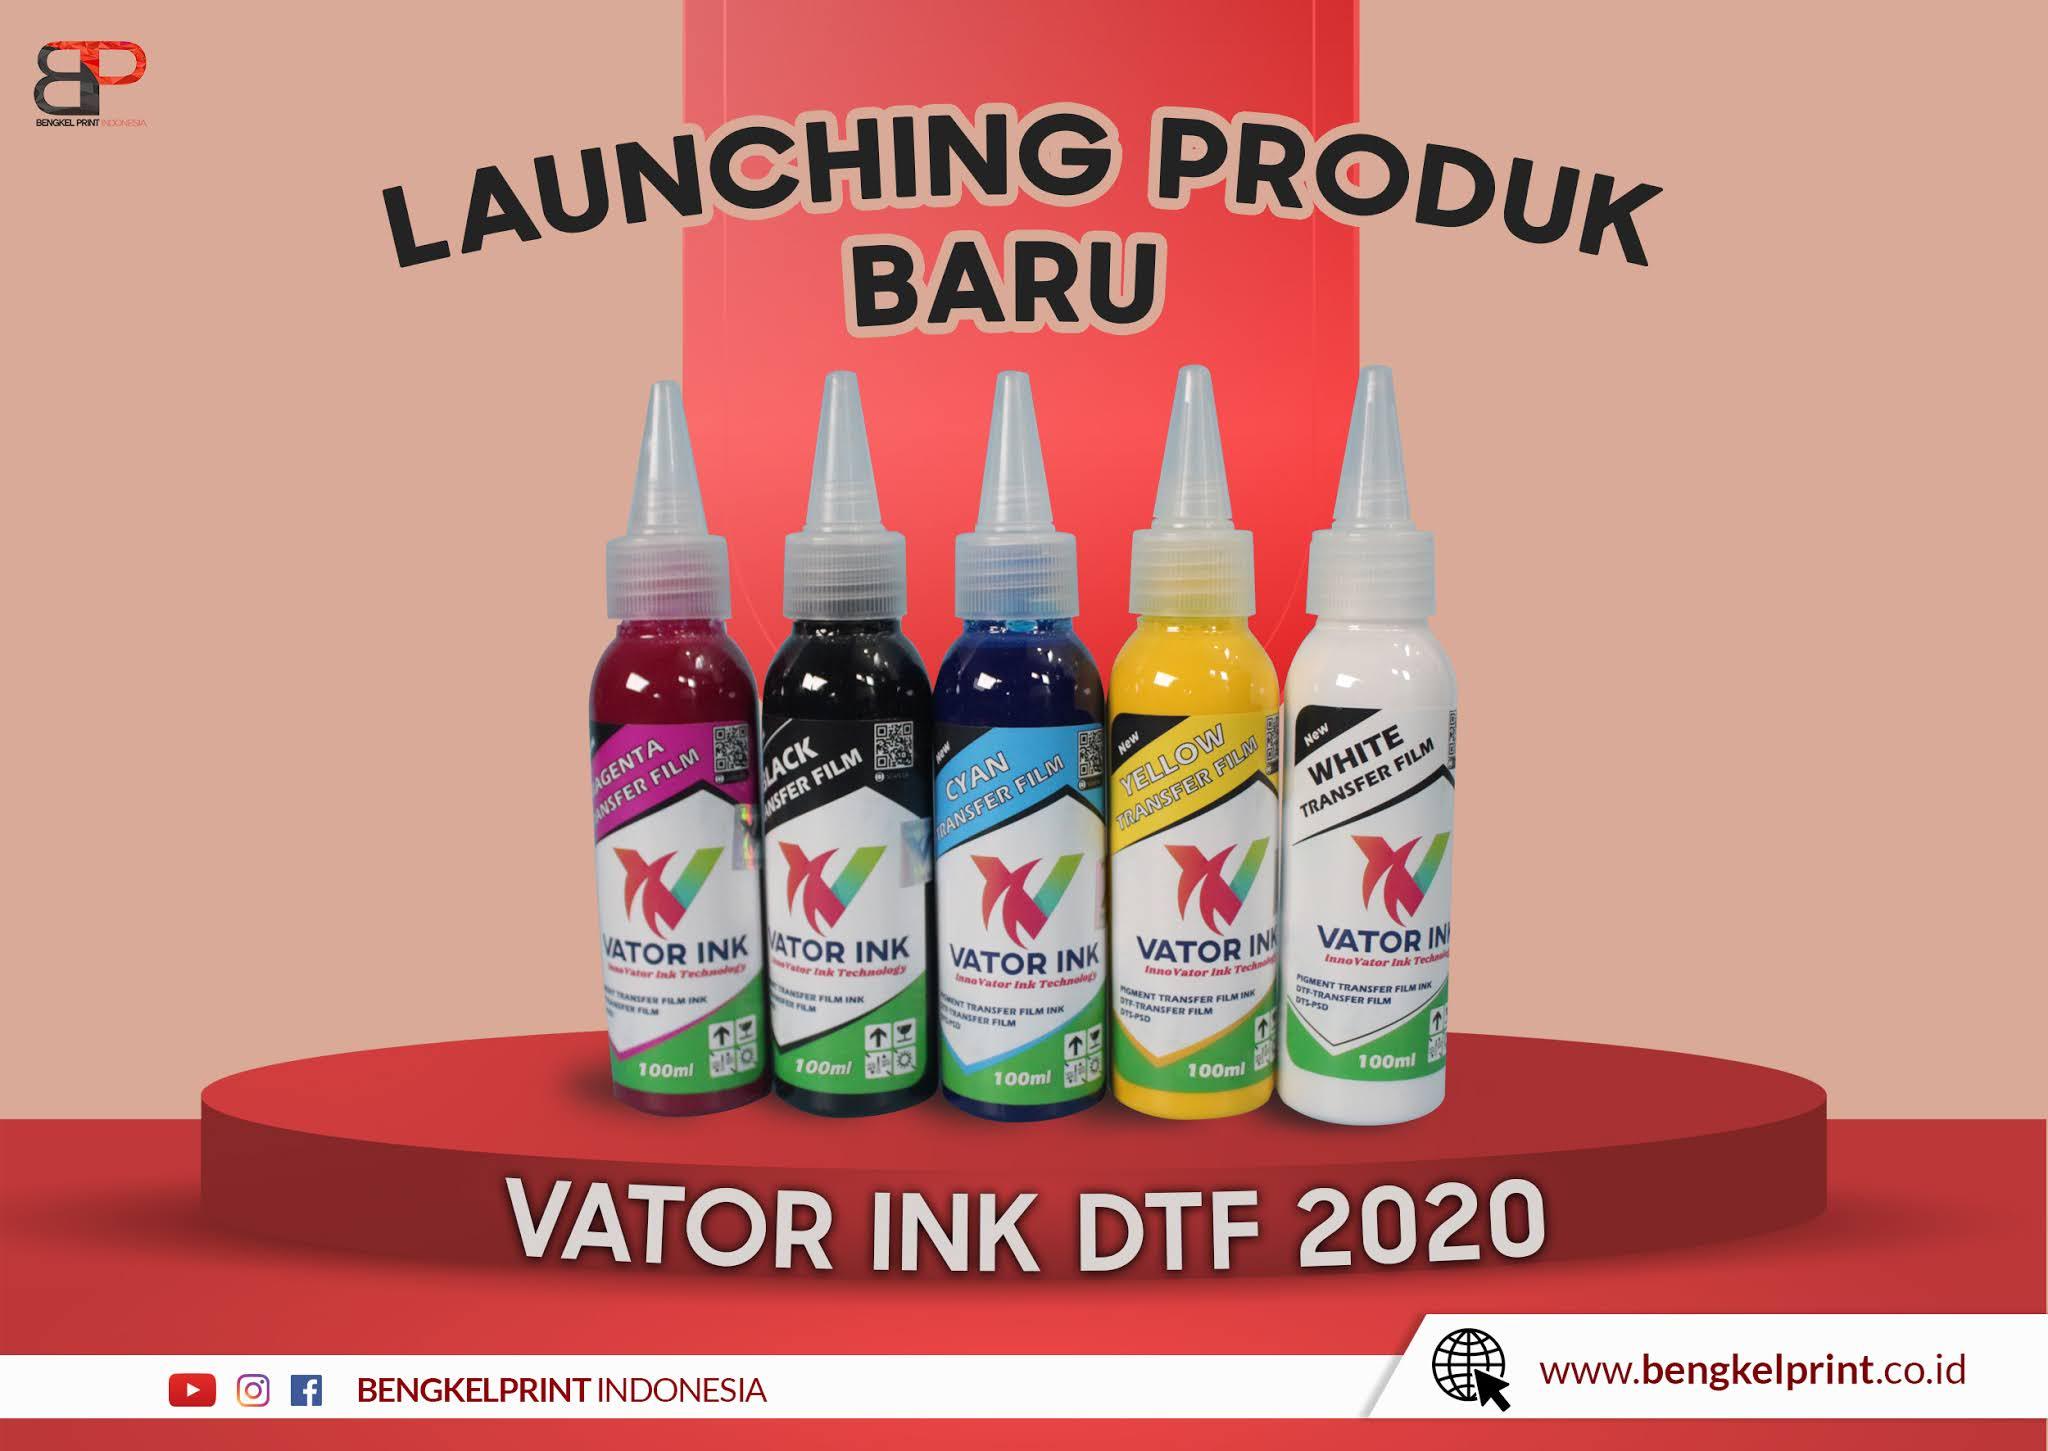 Harga Vator Ink DTF Murah 2020